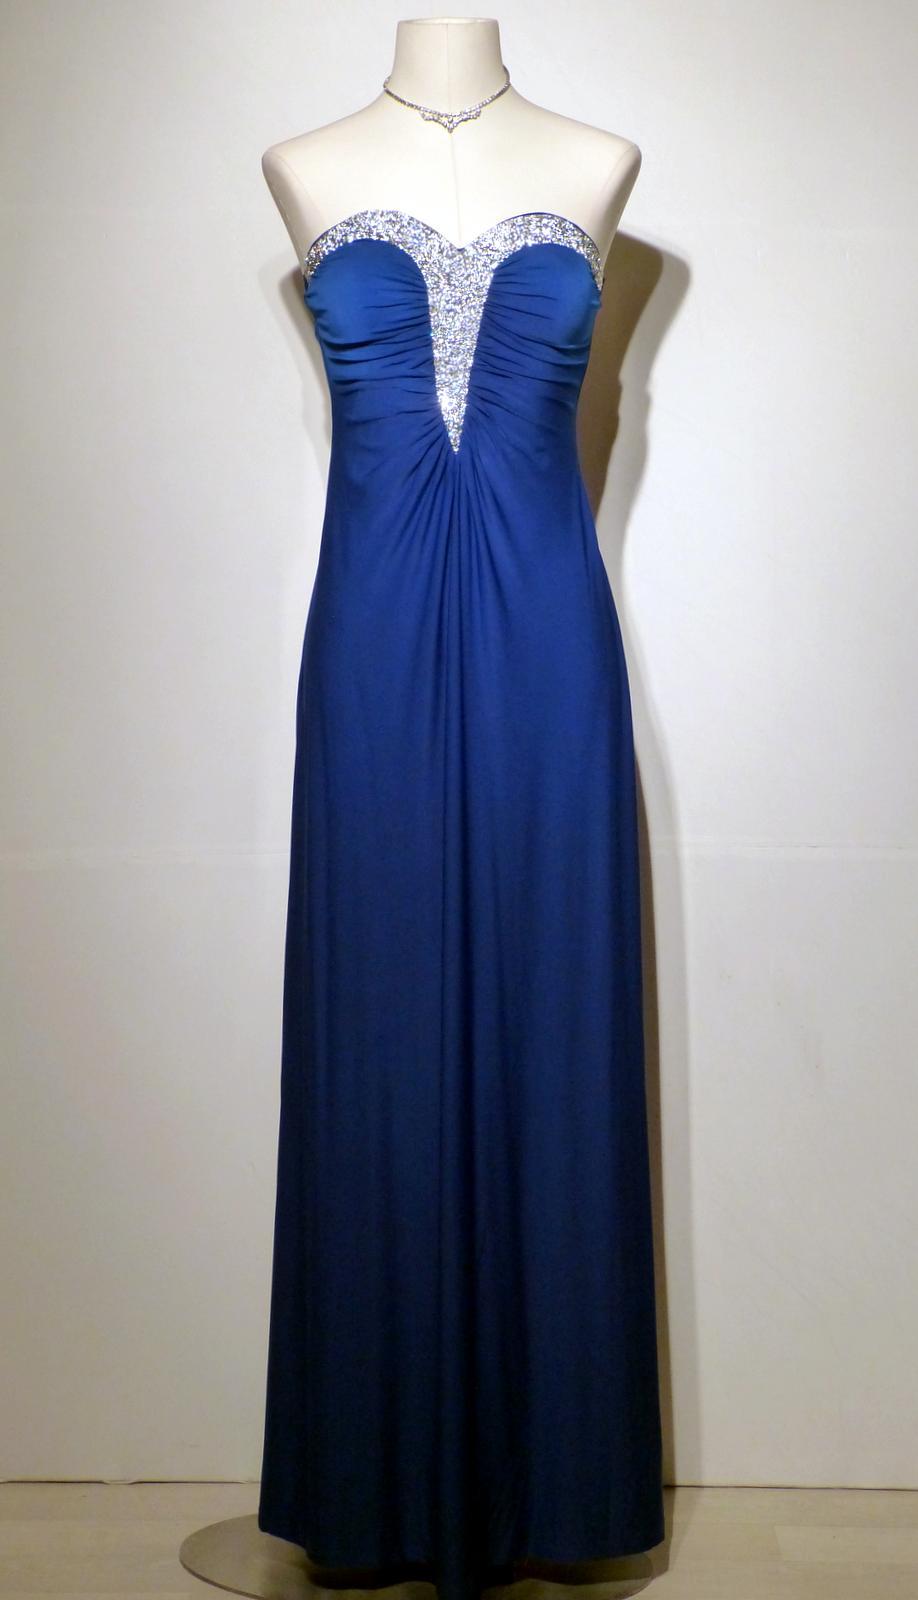 Robes l gantes location robe de soiree taille 50 for Location de robe de mariage en ligne